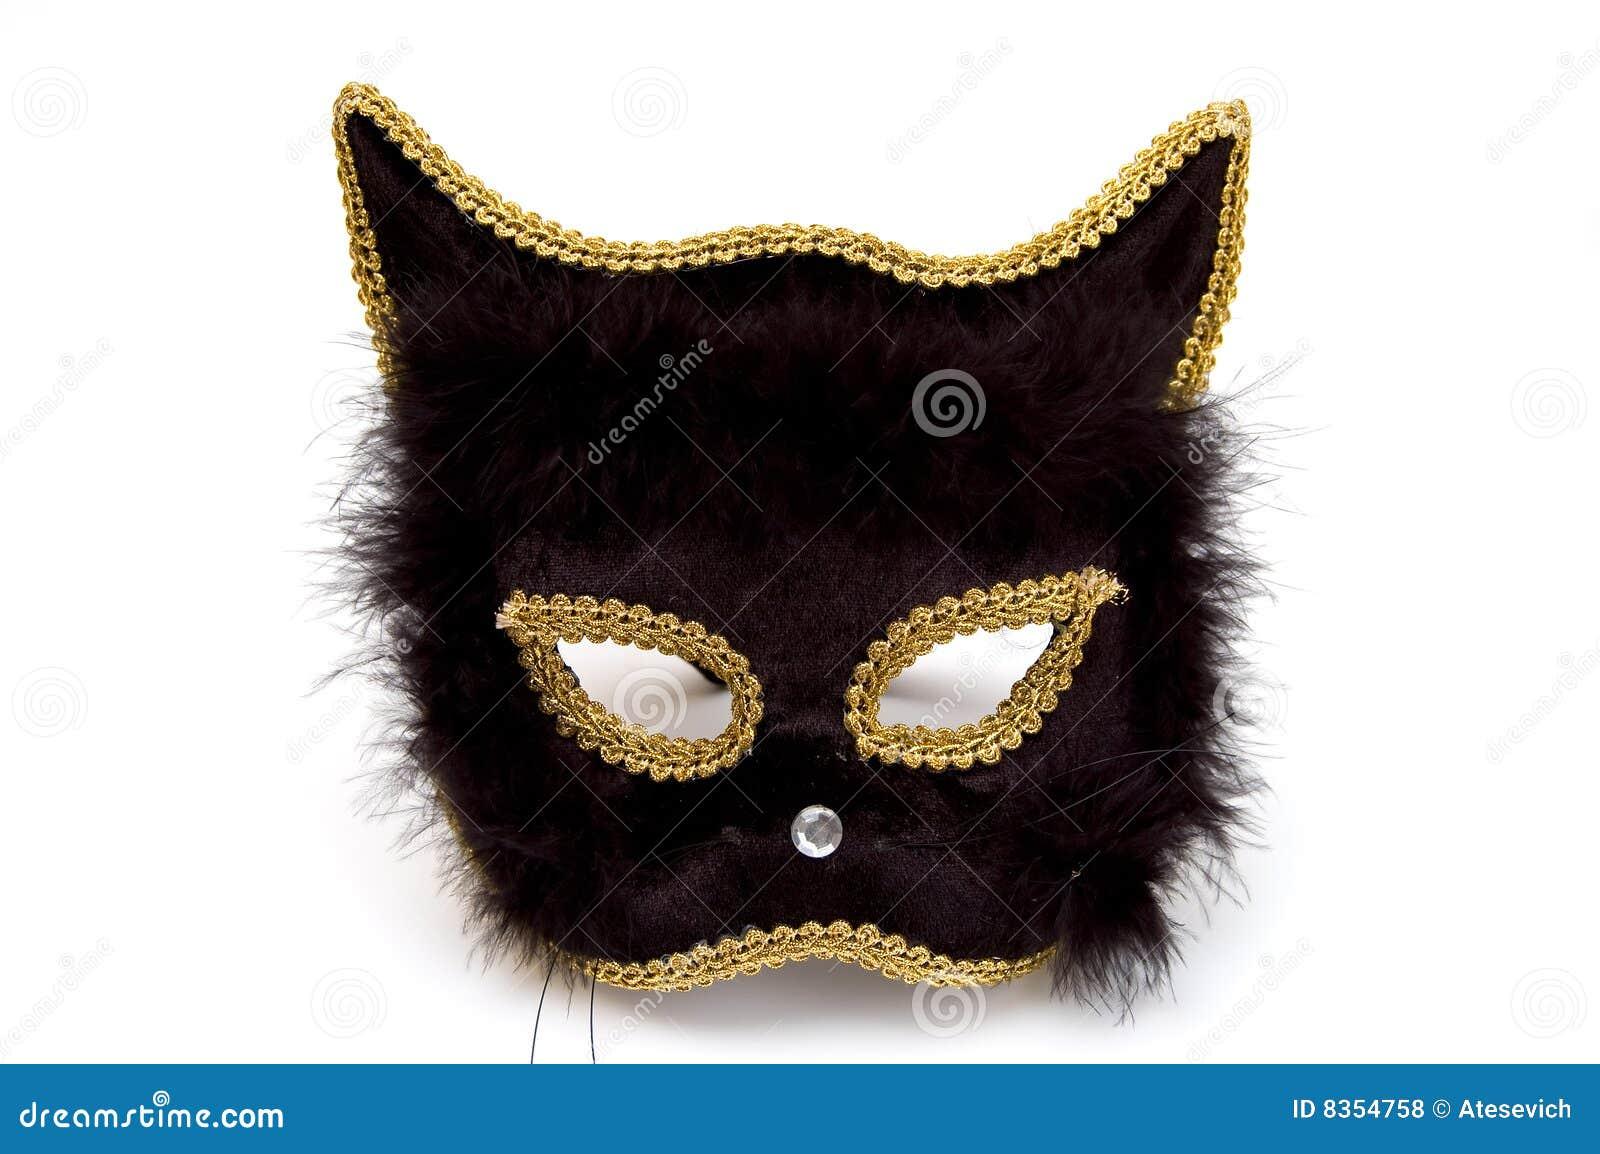 Black Cat Mask Royalty Free Stock Photos - Image: 8354758